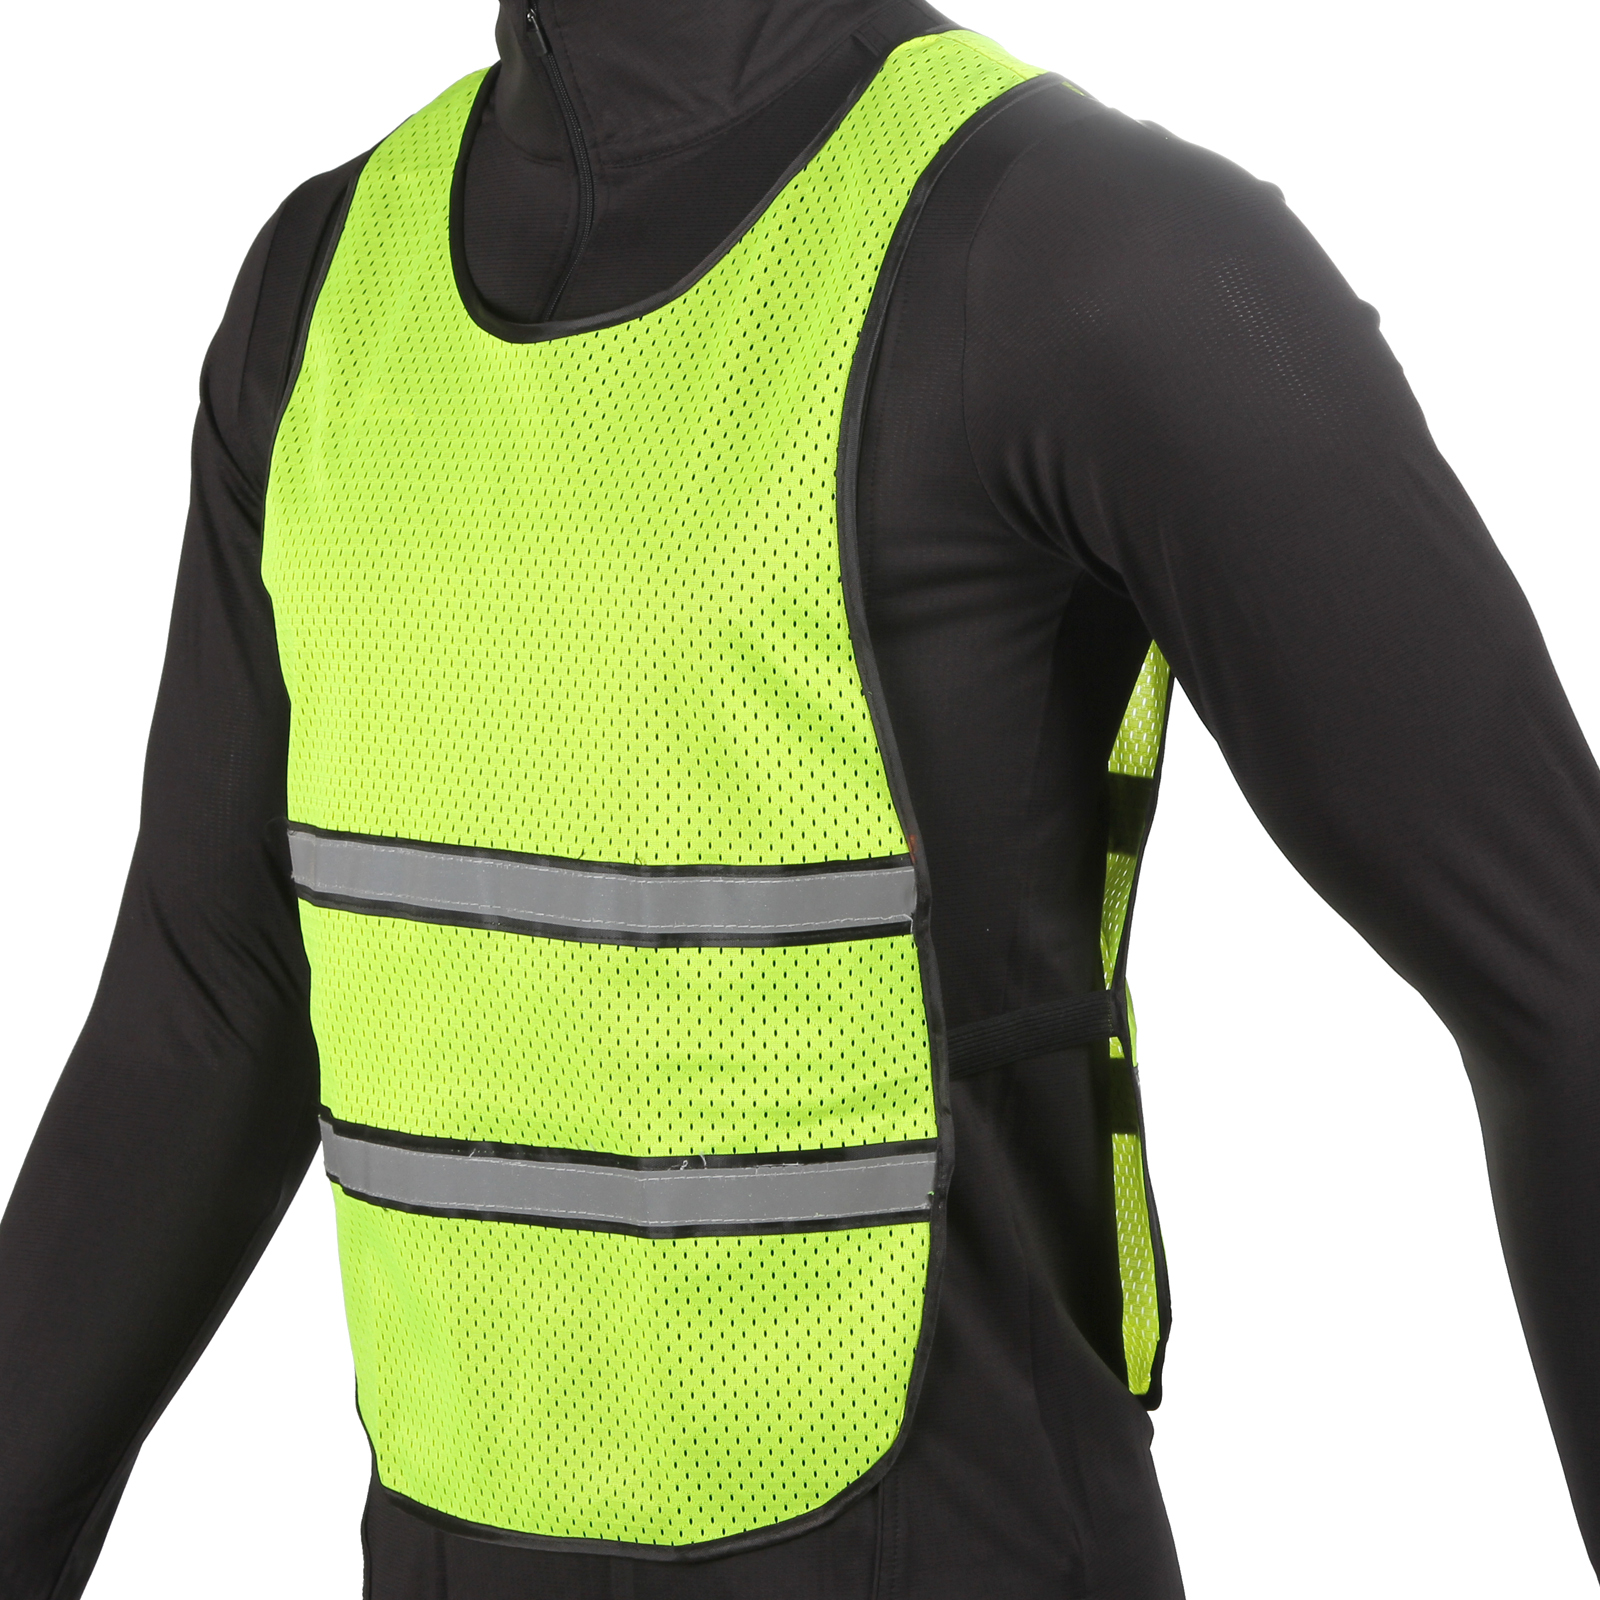 precision running reflective vest bib high viz pink or yellow one size ebay. Black Bedroom Furniture Sets. Home Design Ideas